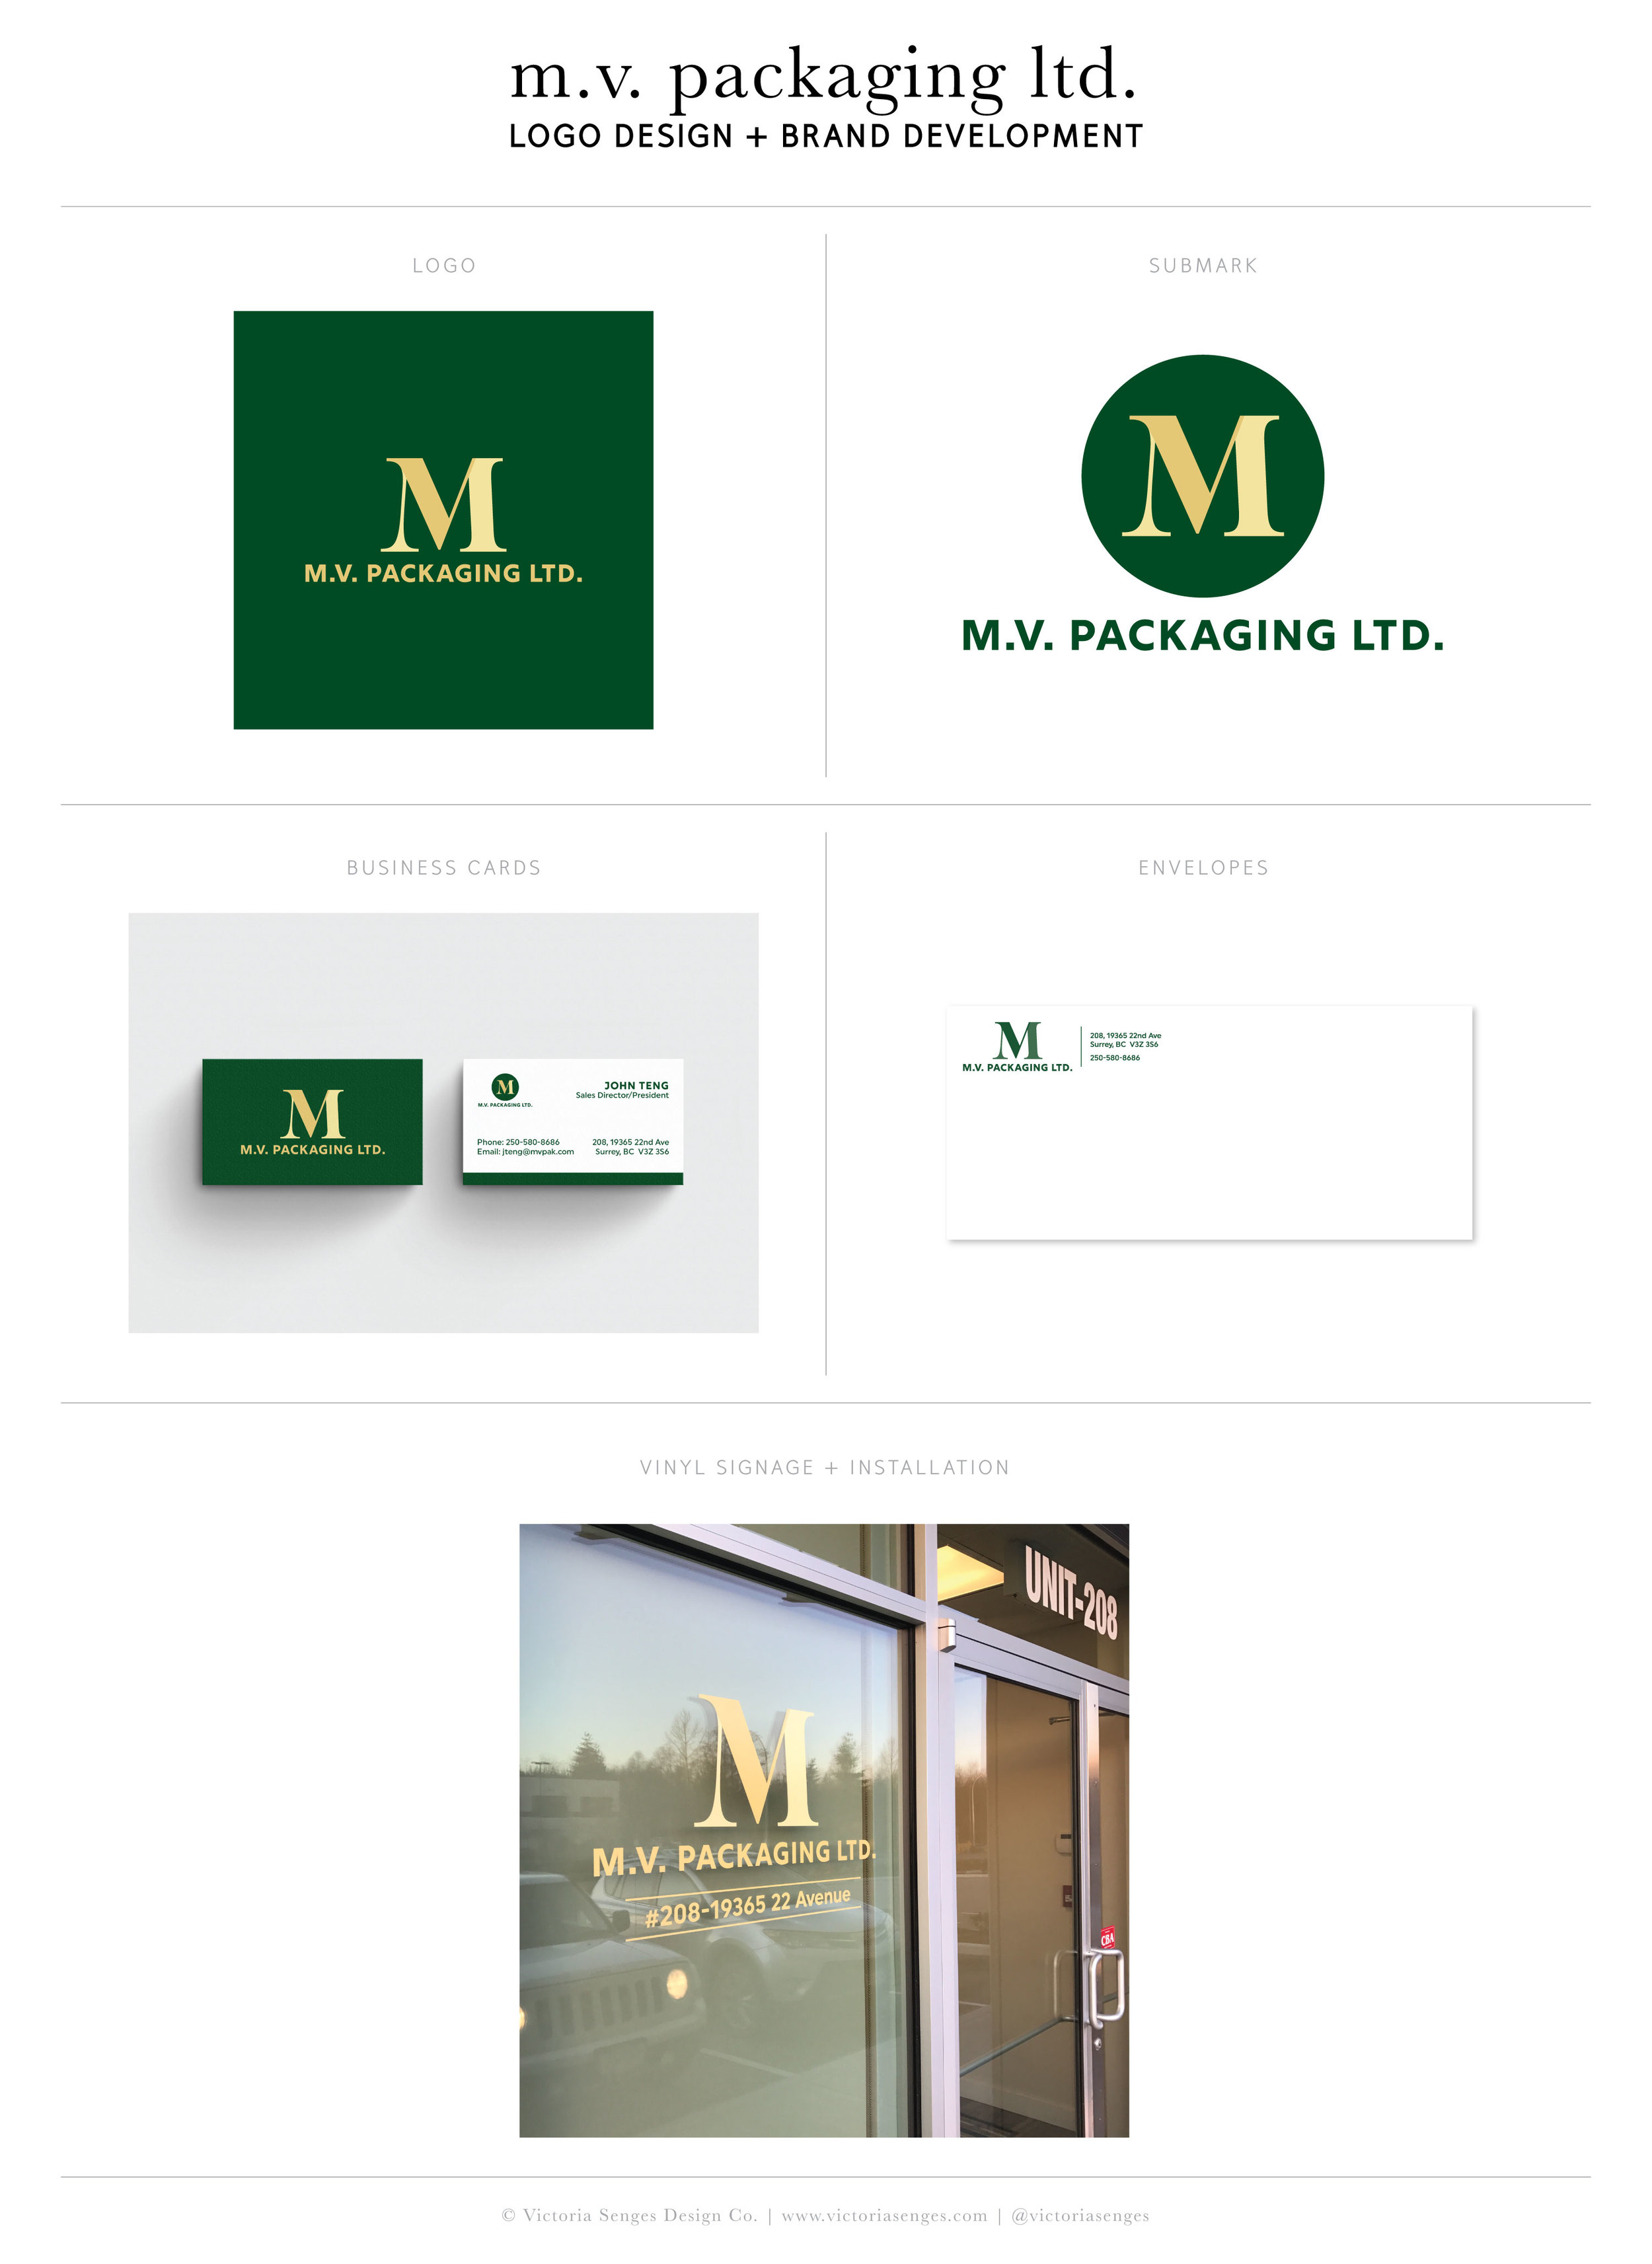 mvpak-branding.jpg